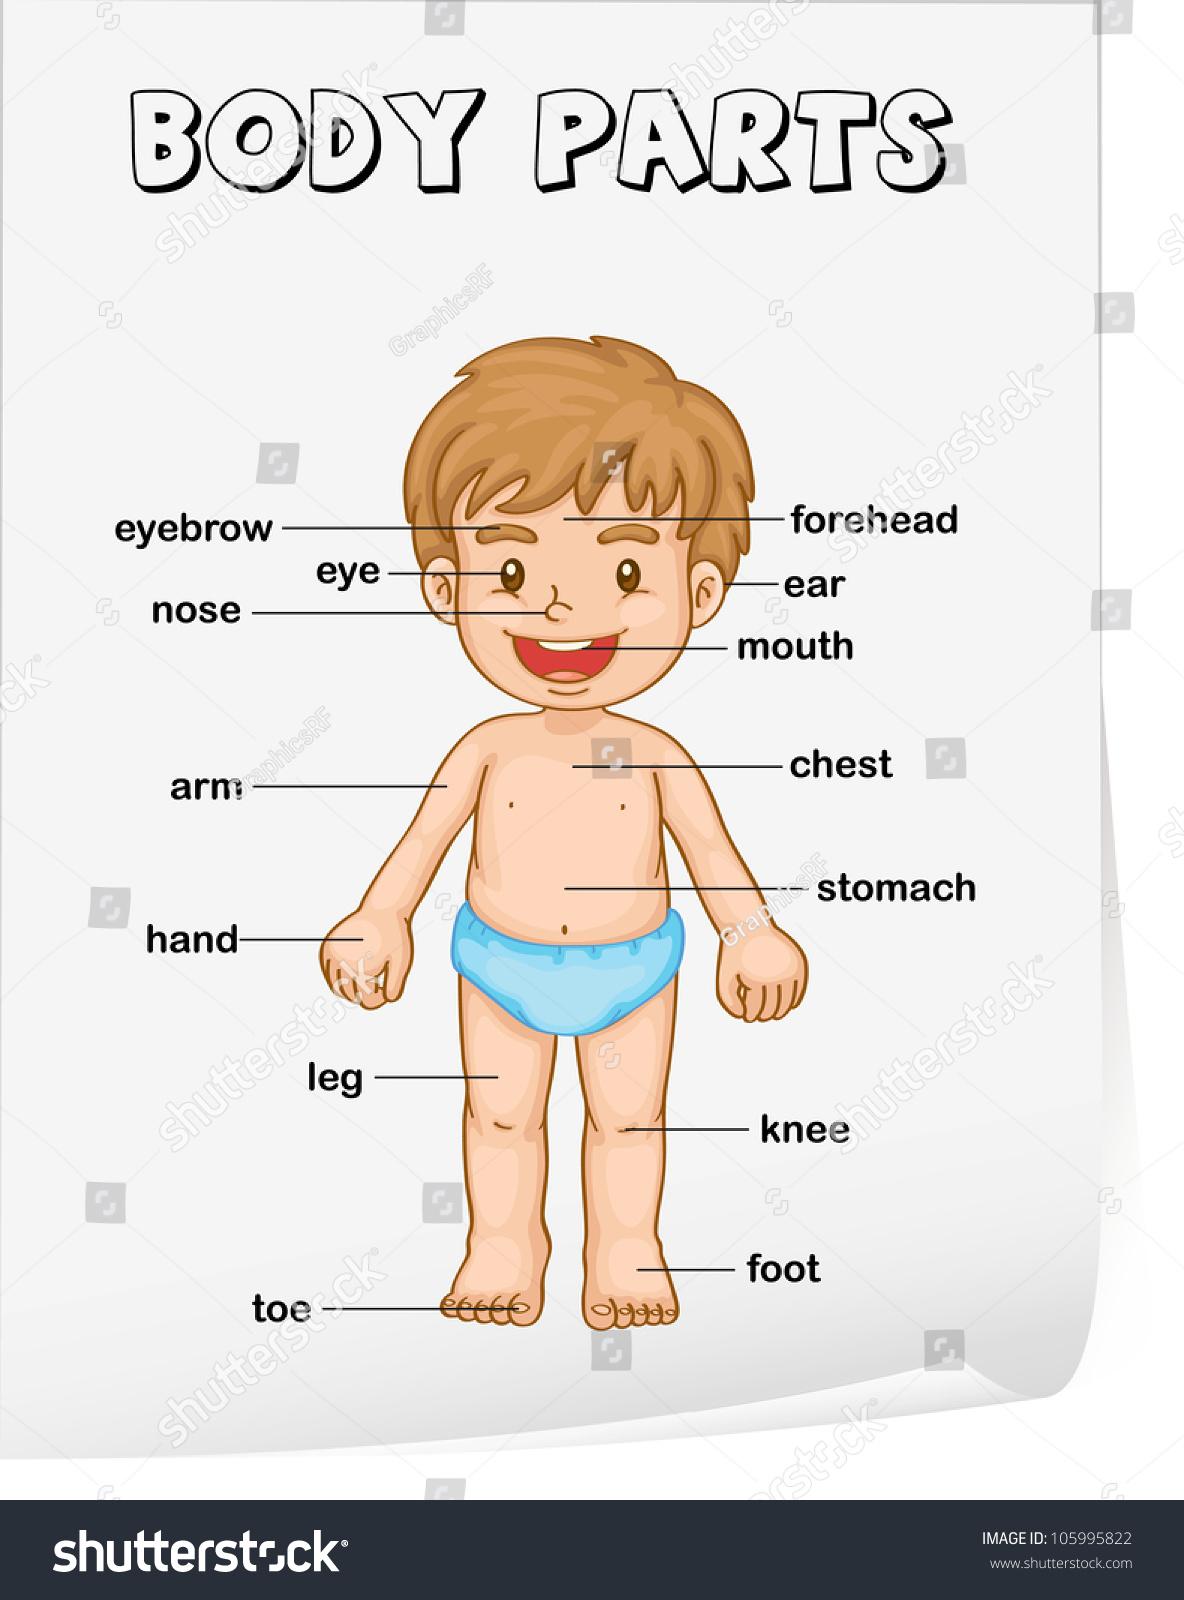 worksheet Parts Of The Body Worksheet royalty free vocabulary worksheet parts of the body 105995822 105995822